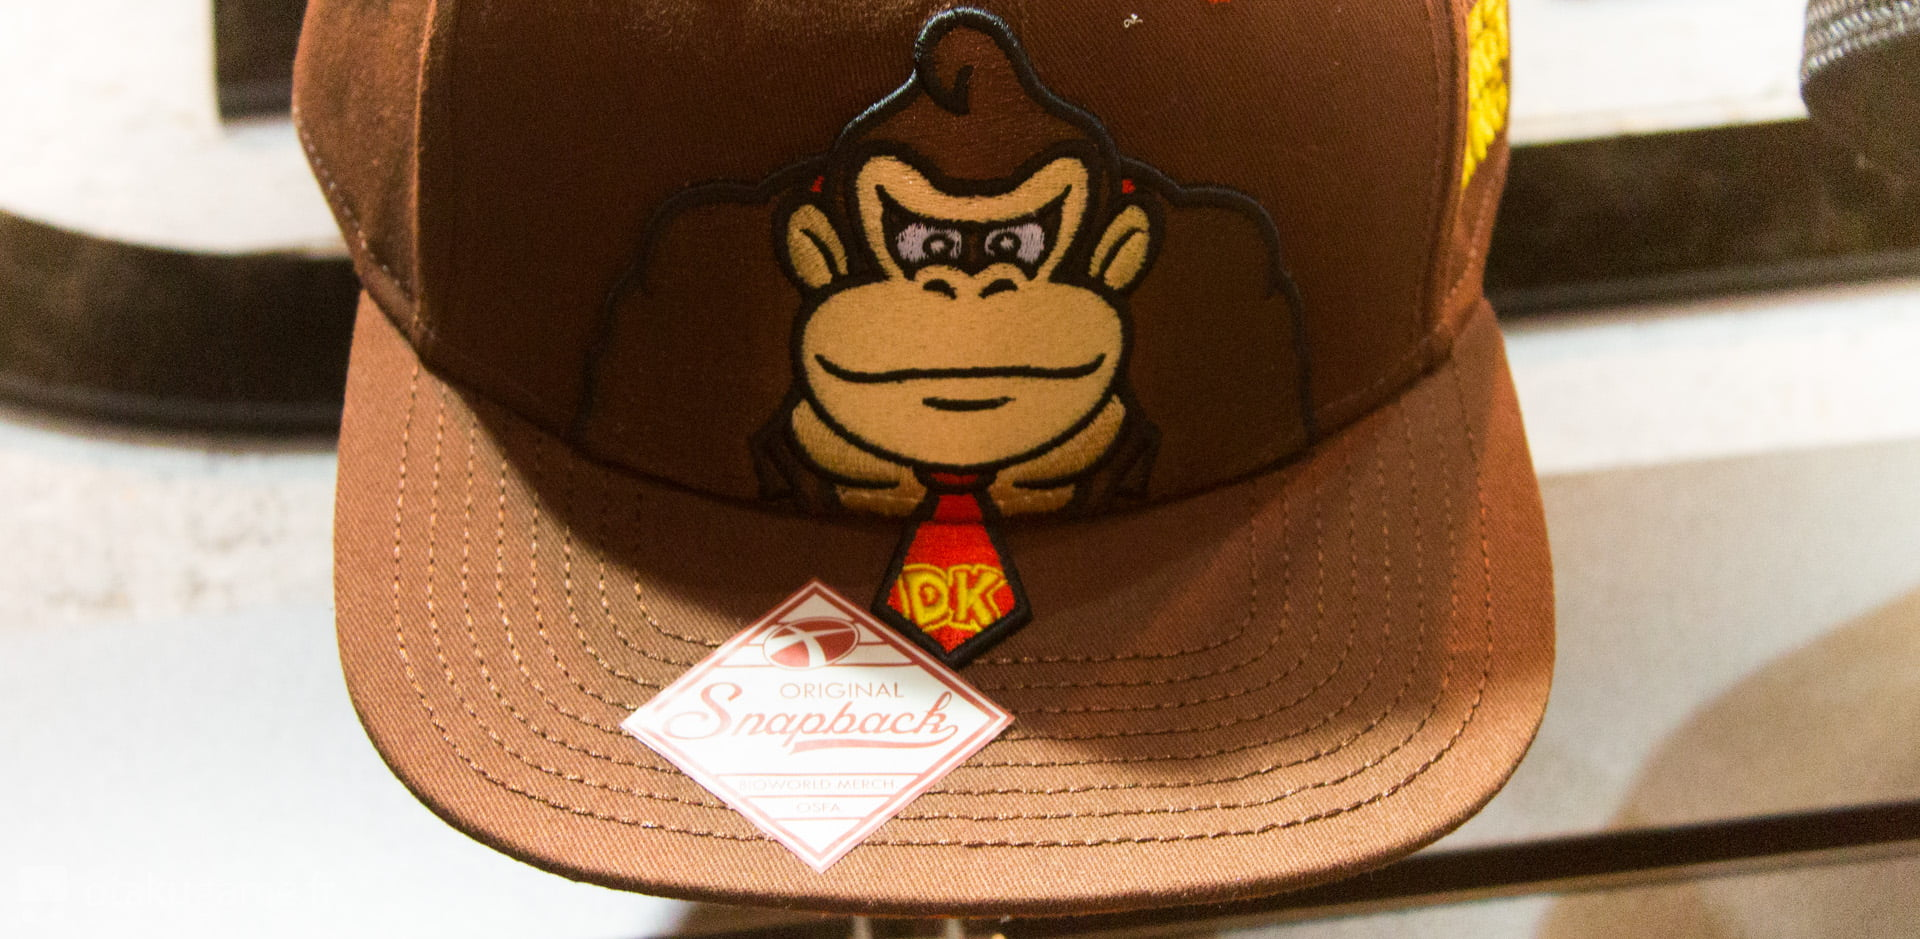 La casquette Donkey Kong